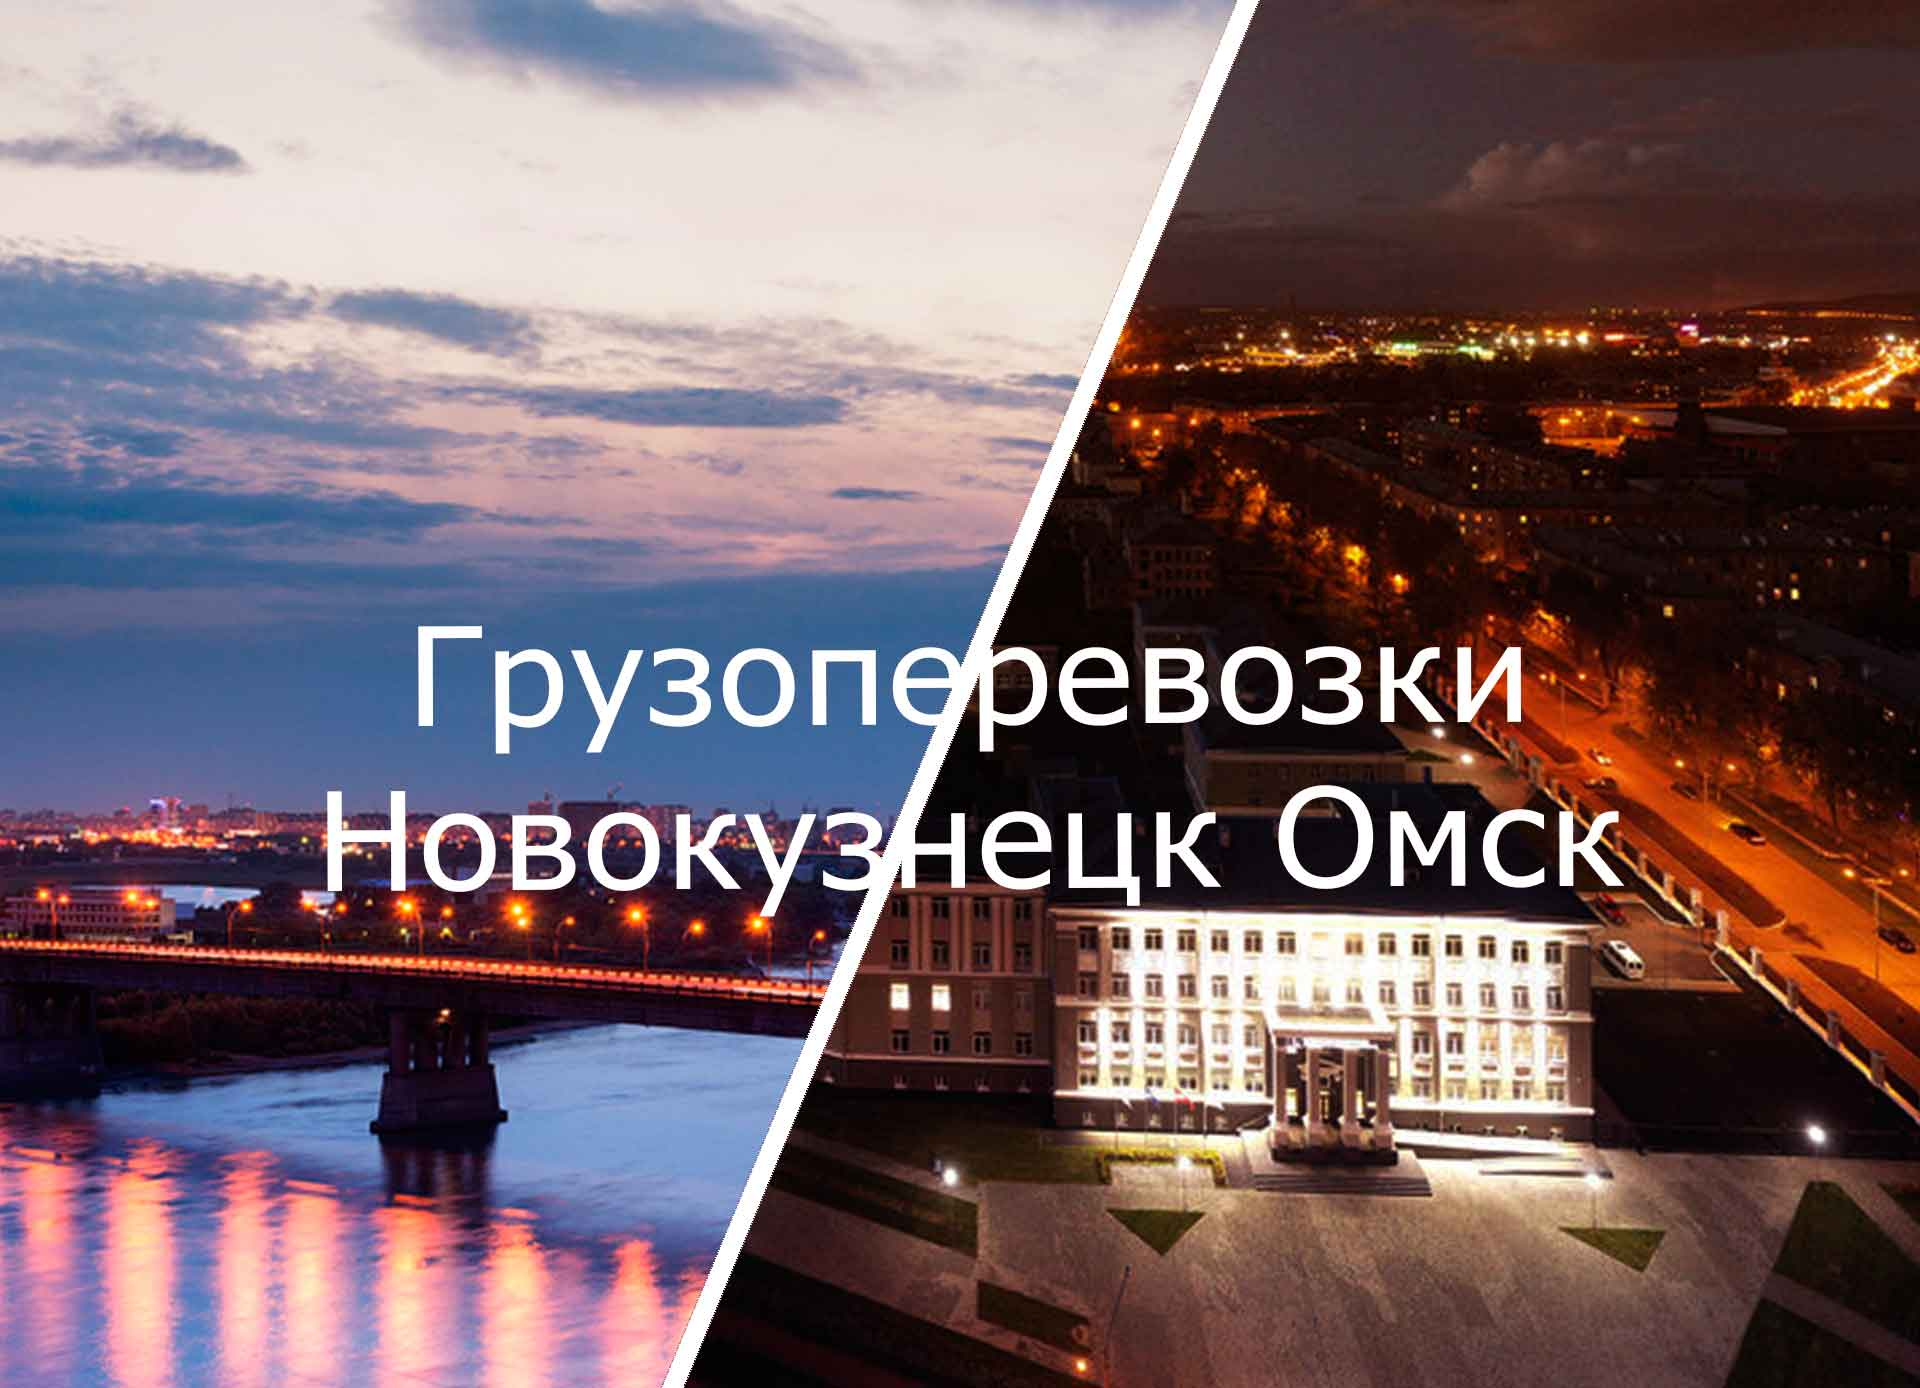 грузоперевозки новокузнецк омск